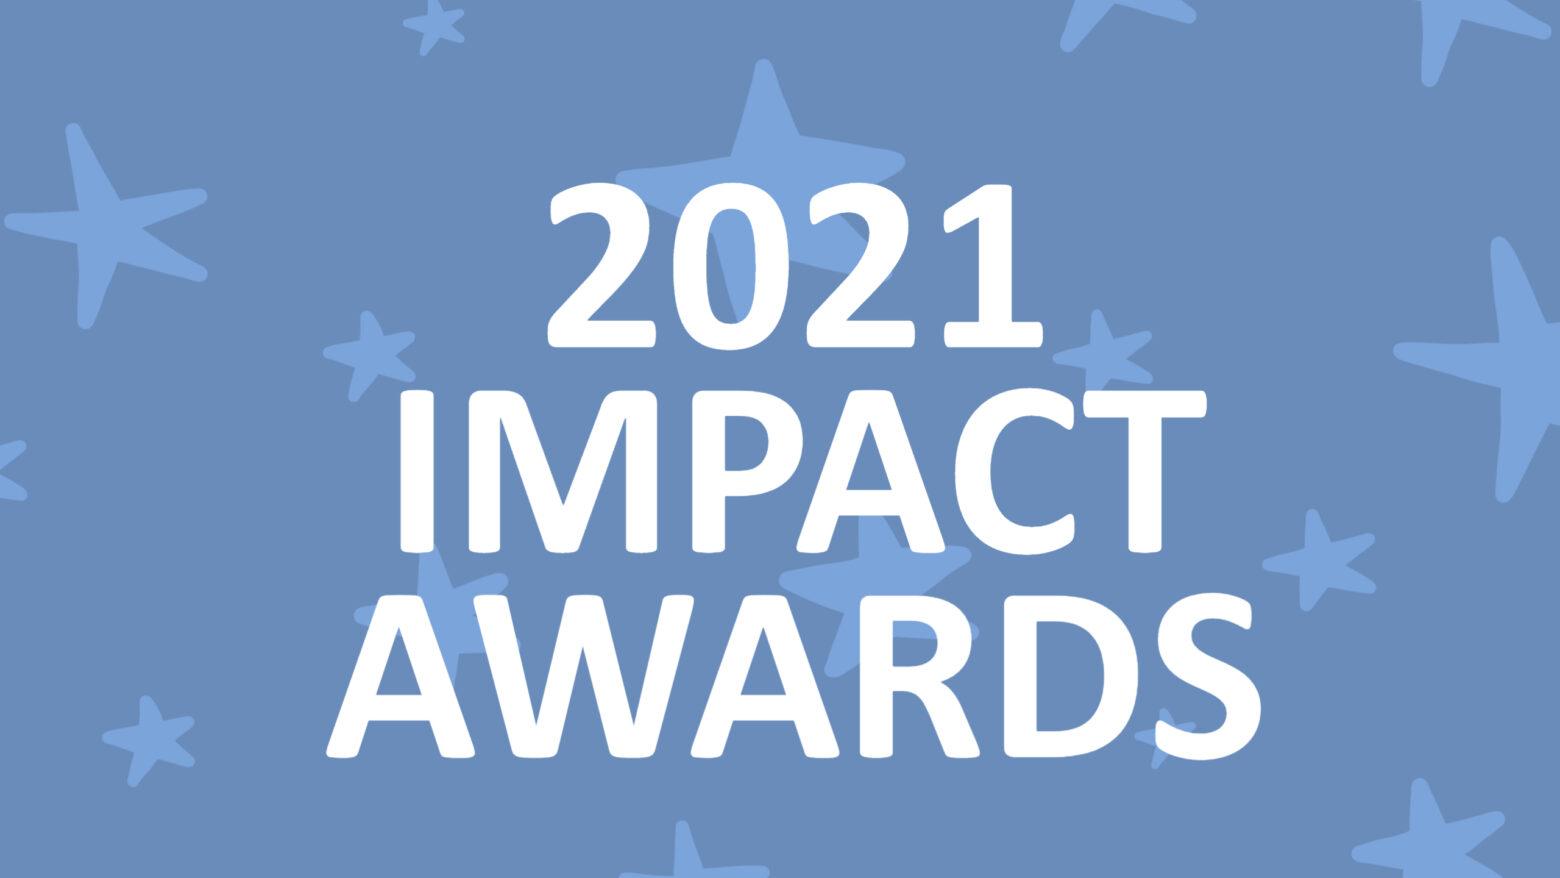 2021 Impact Awards